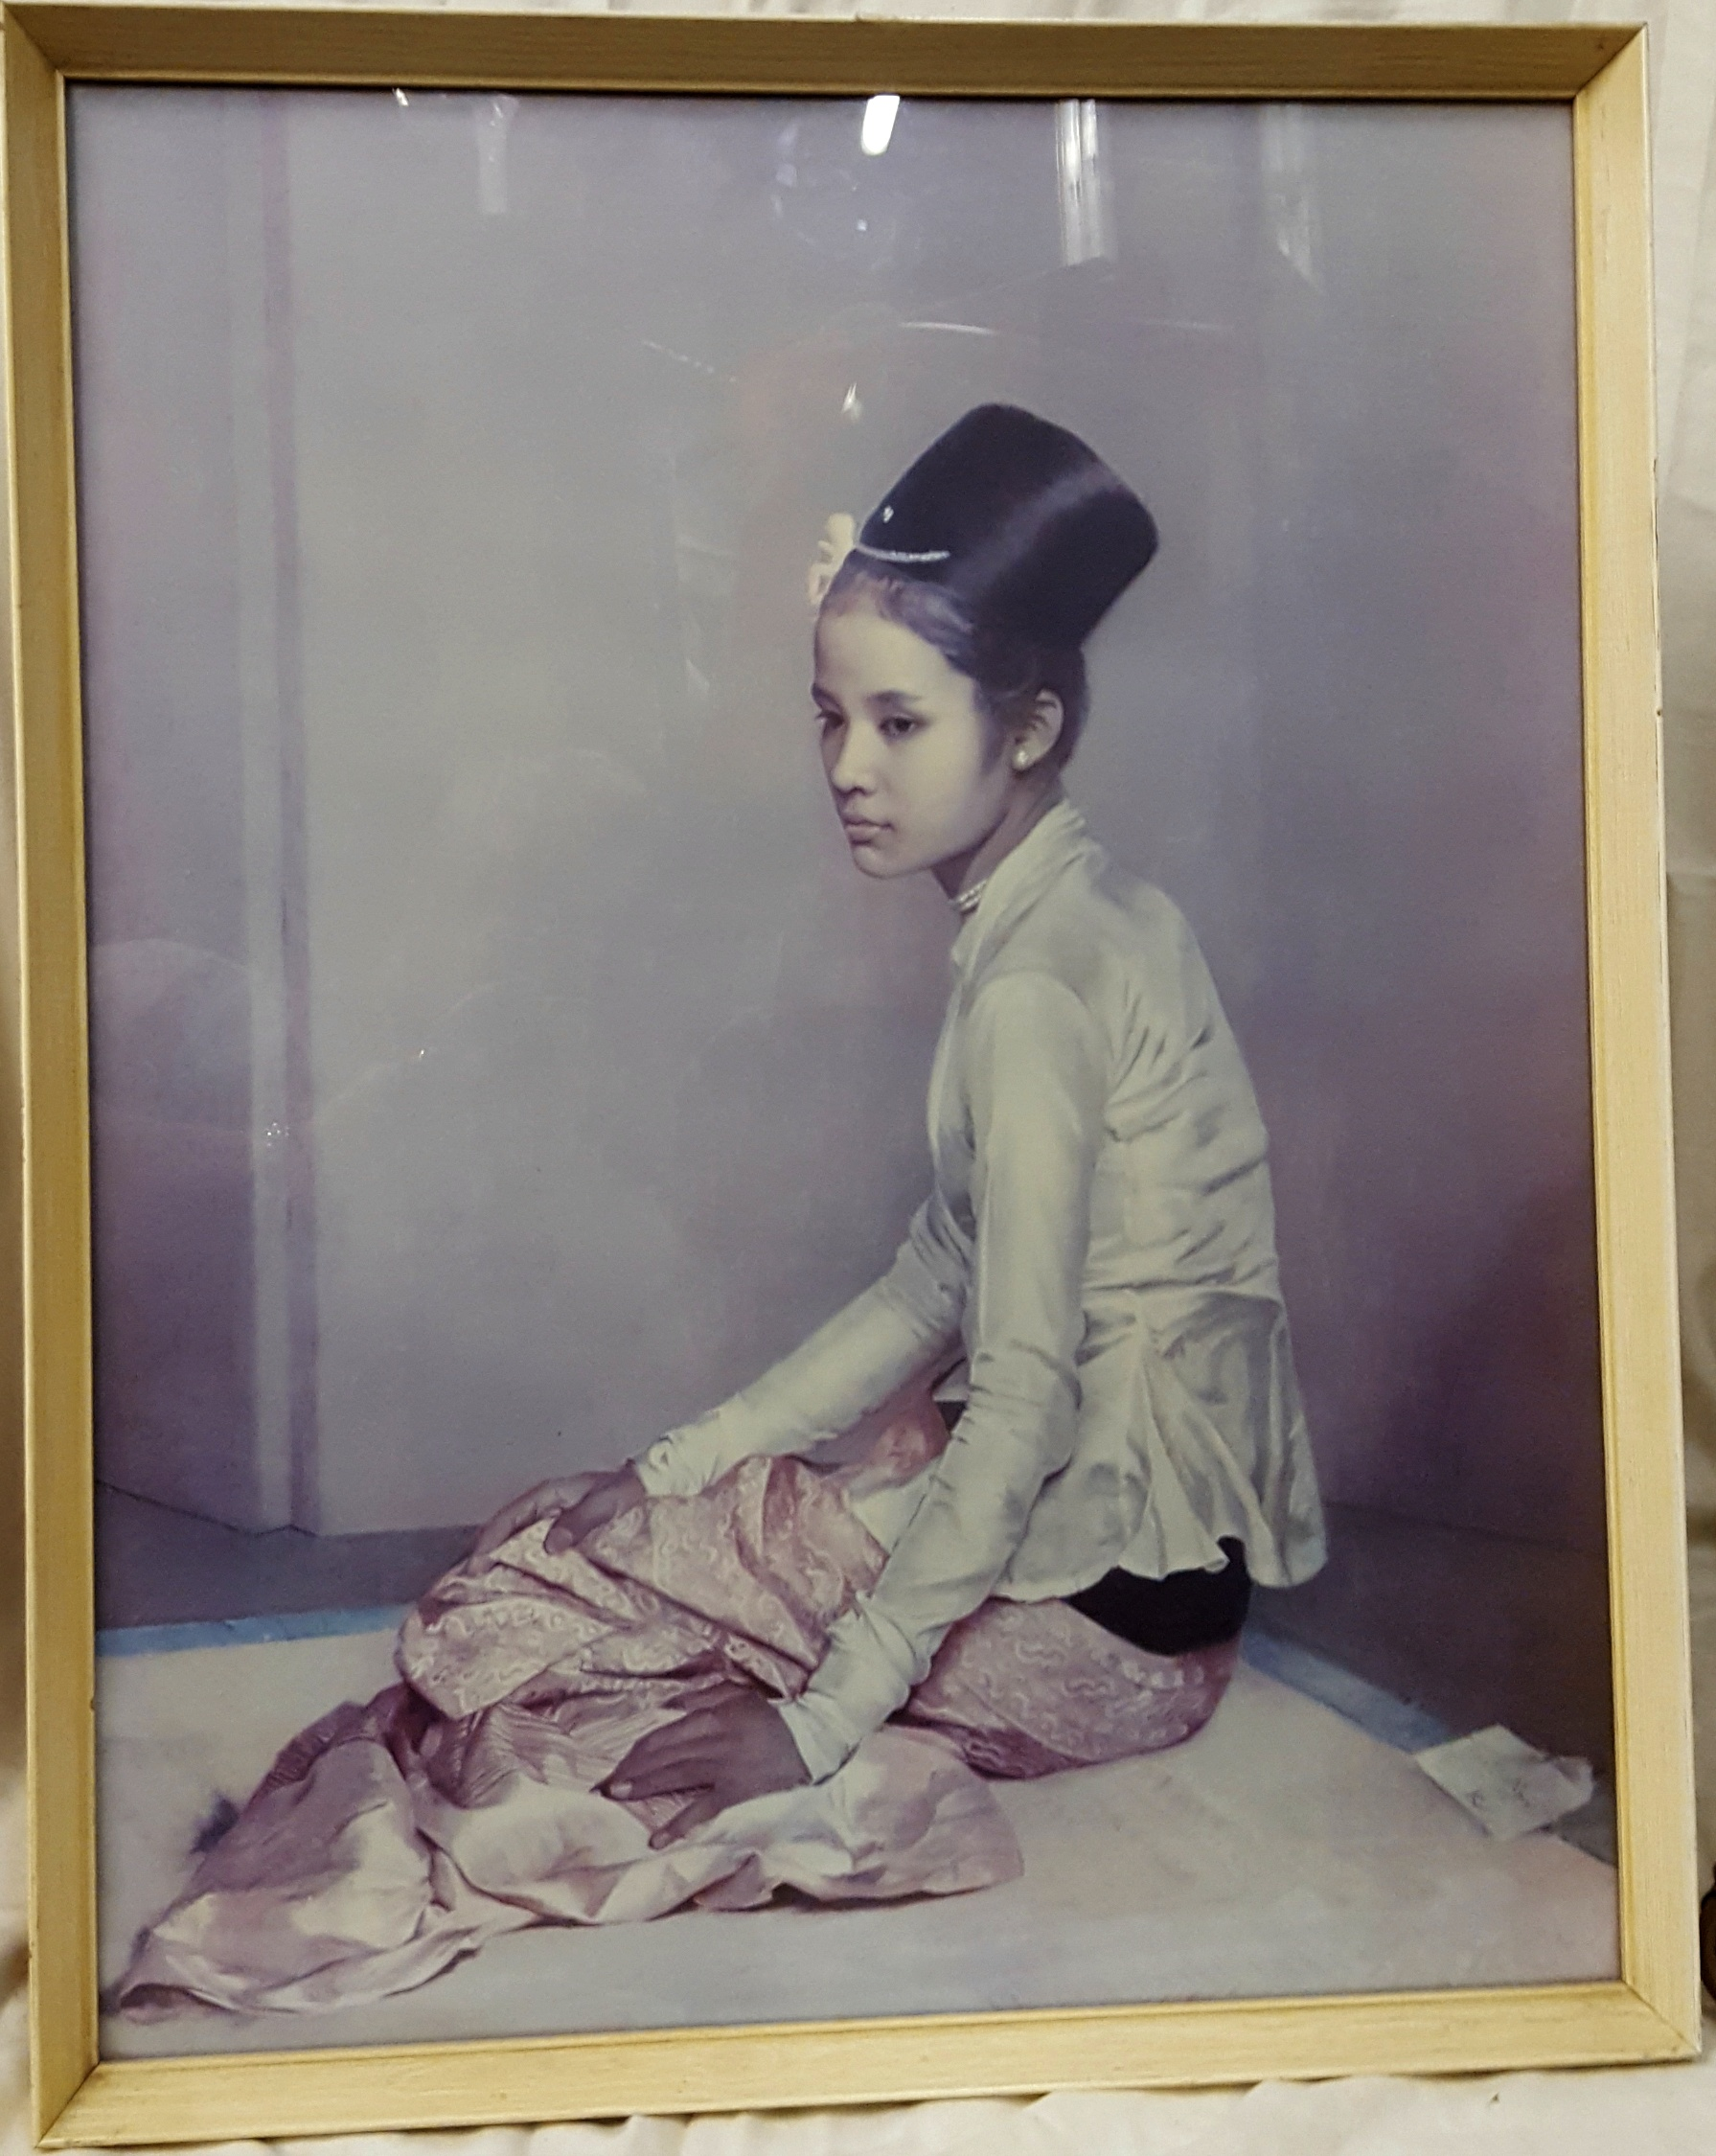 Lot 48 - Vintage Retro Print of Princess Saw Ohn Nyun by Sir Gerald Kelly c1960's In Original Frame